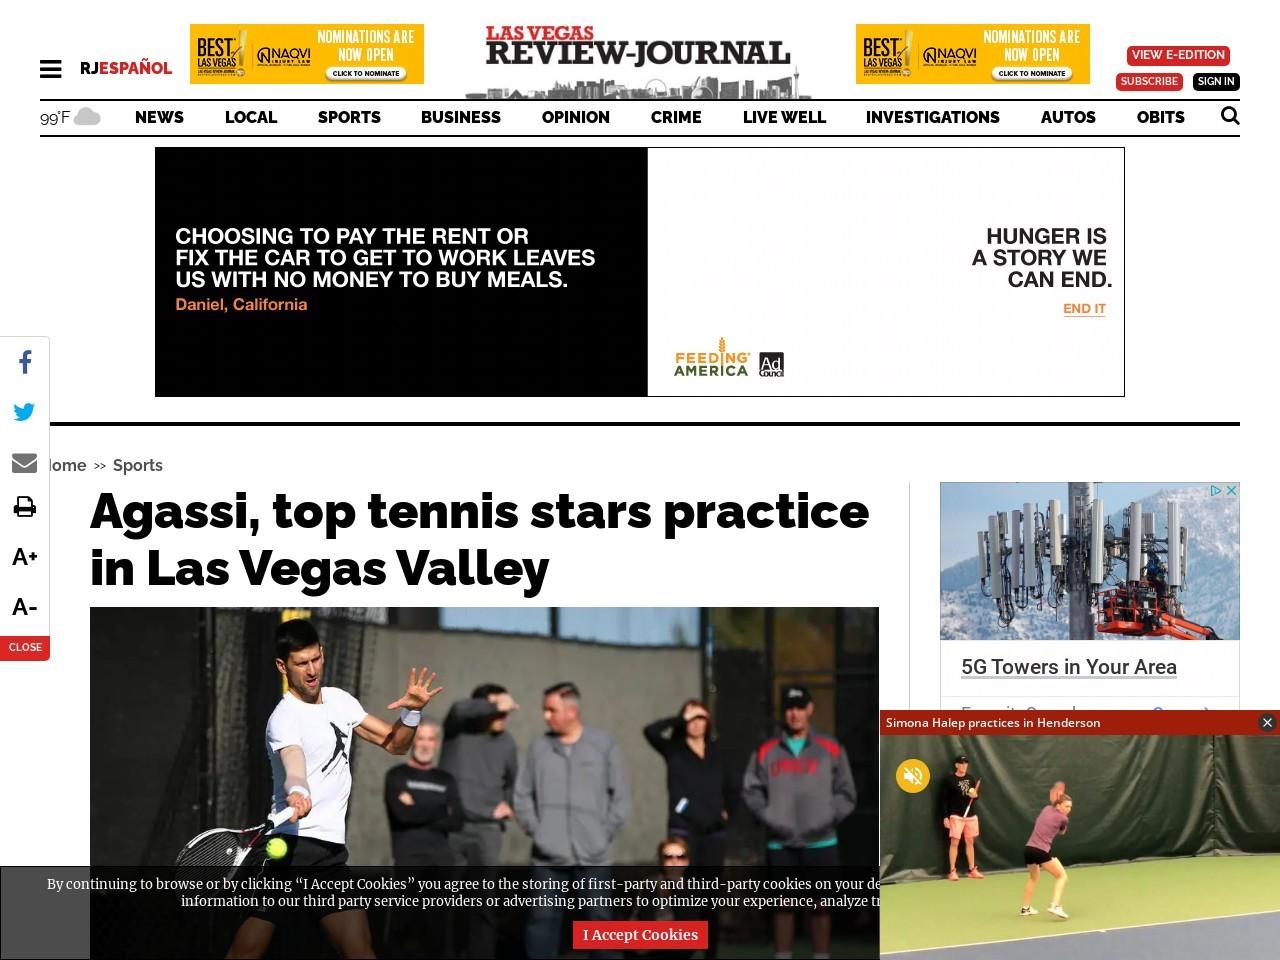 Agassi, top tennis stars practice in Las Vegas Valley